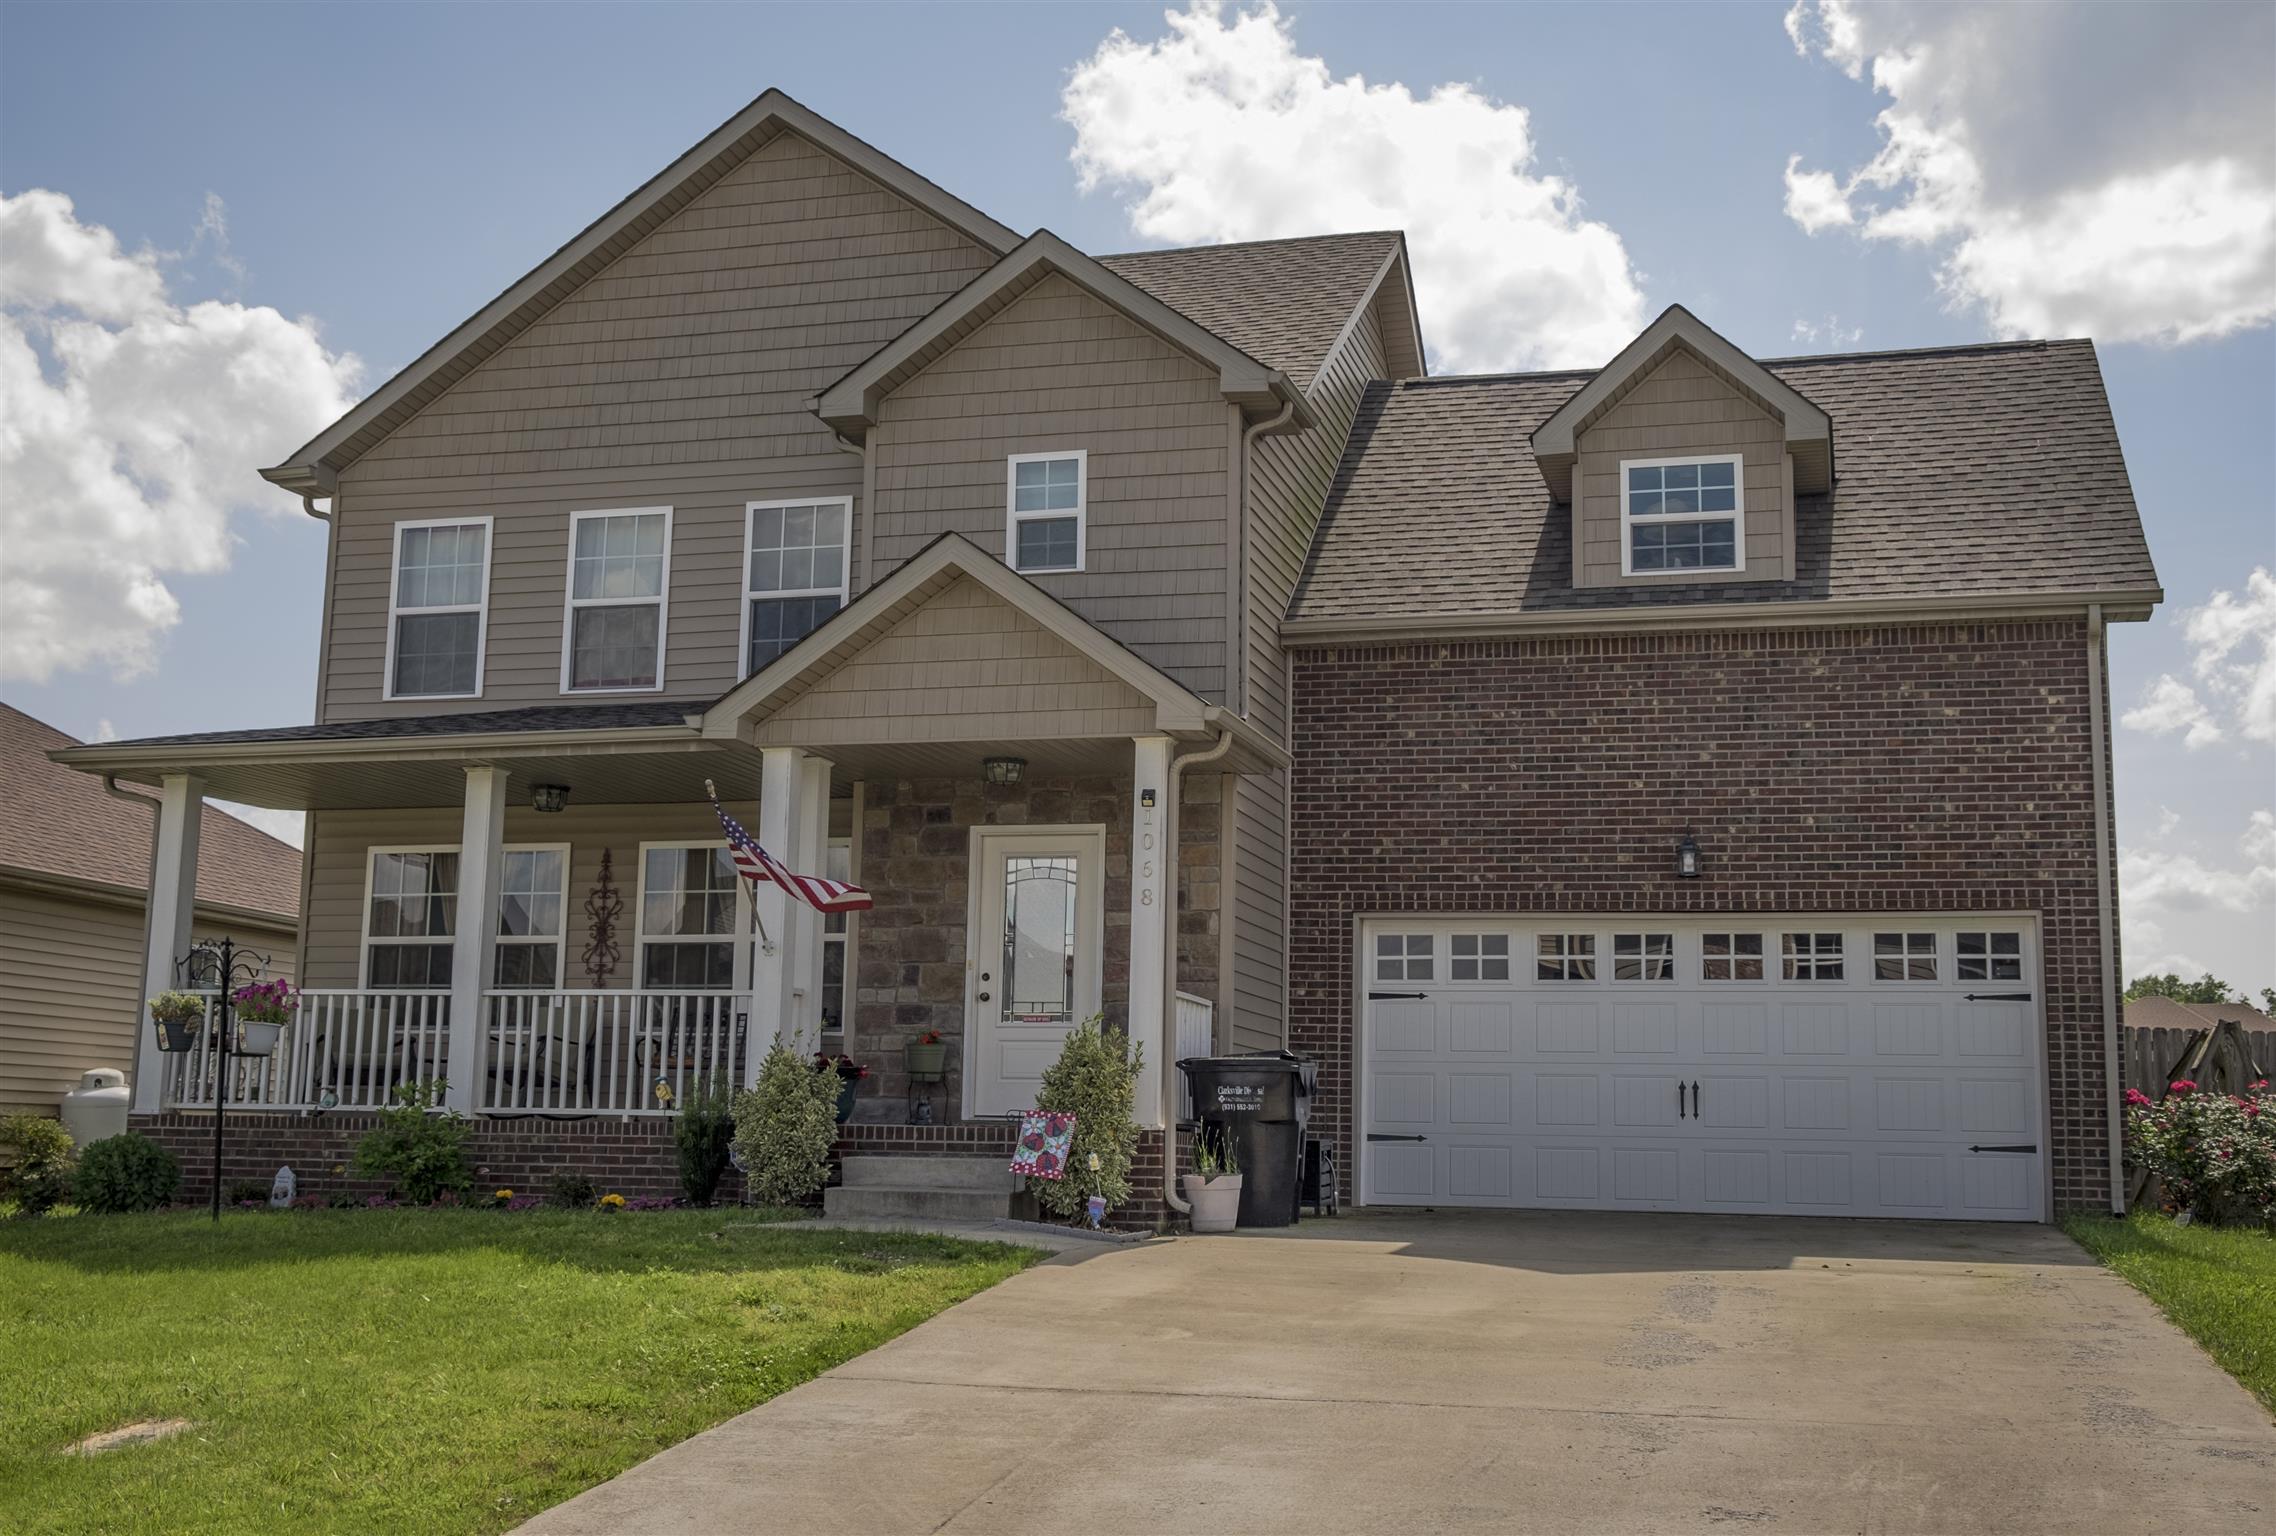 1068 Castlerock Dr, Clarksville, TN 37042 - Clarksville, TN real estate listing